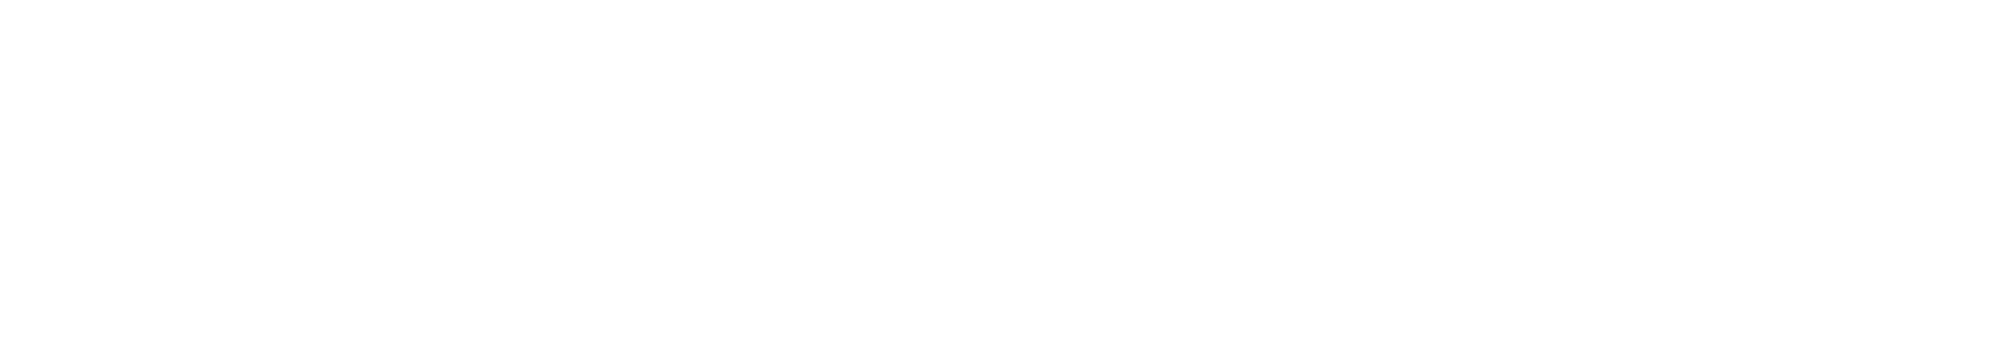 Bexeo GmbH